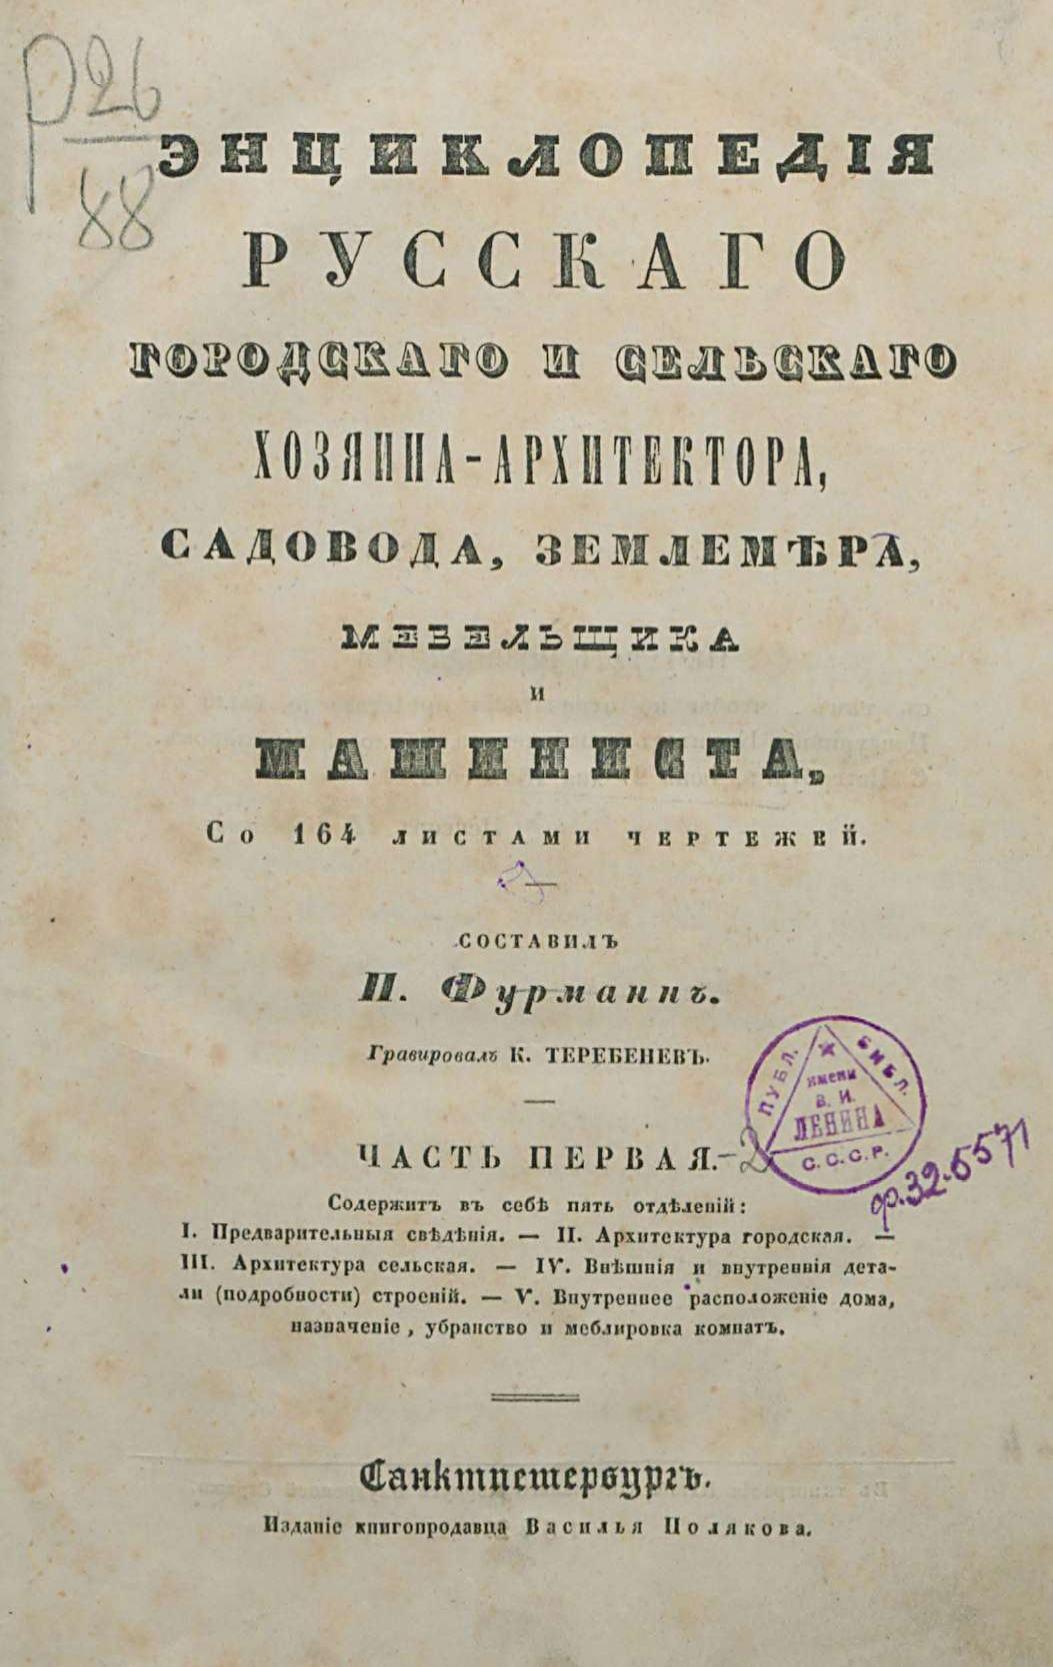 furmann-entciclopediia-russkogo-gorodskogo-i-selskogo-hoziaina-arhitektora-ch1-1842_Page7.jpg